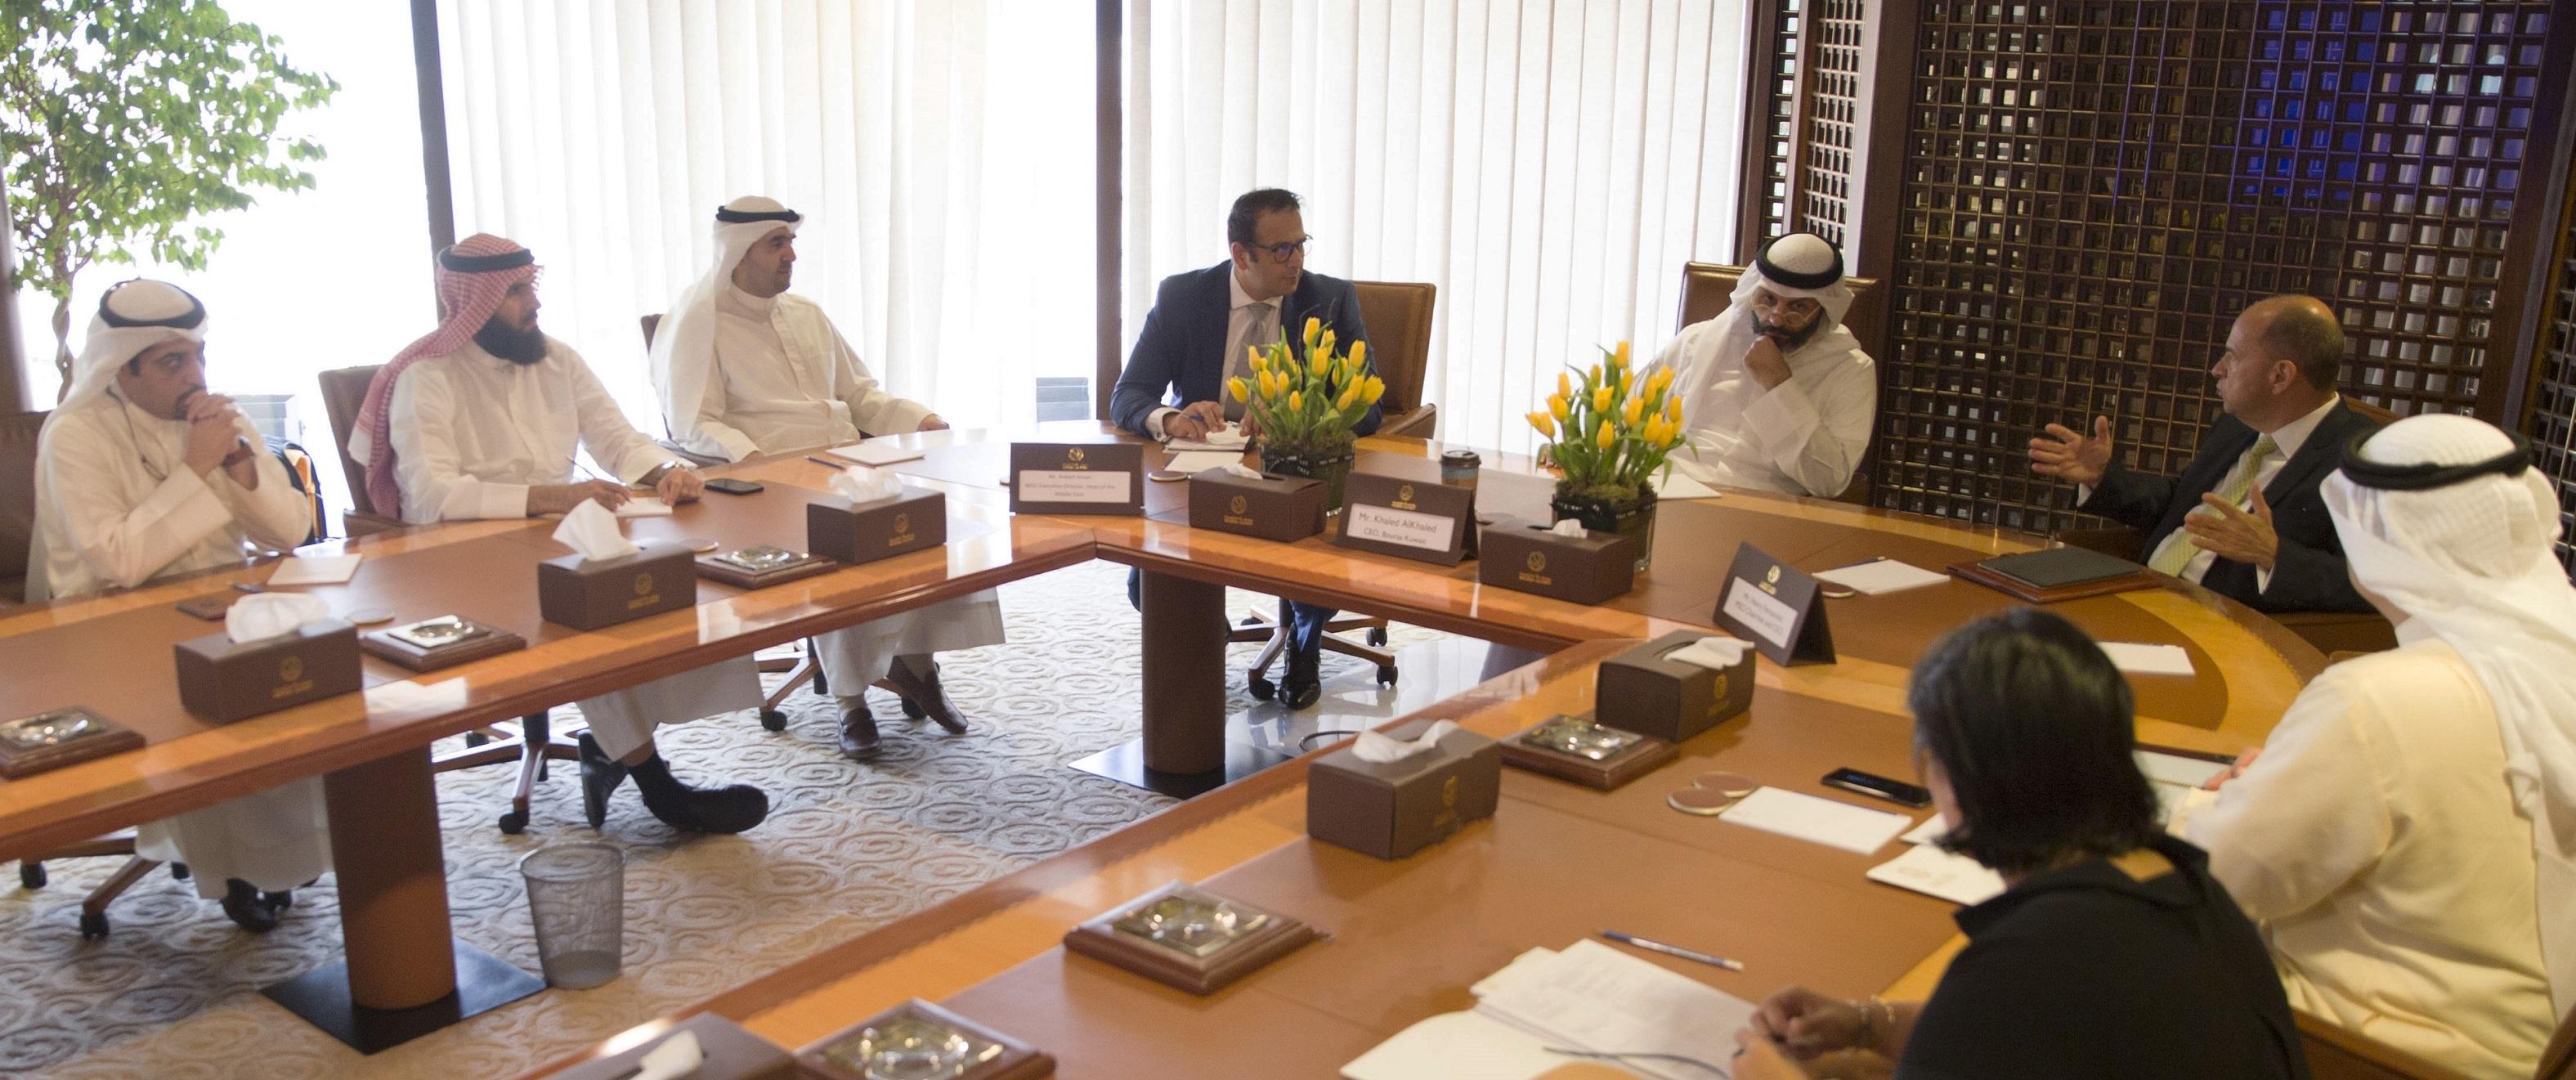 KUNA : MSCI Kuwait Index may soon be reclassified to Emerging Market